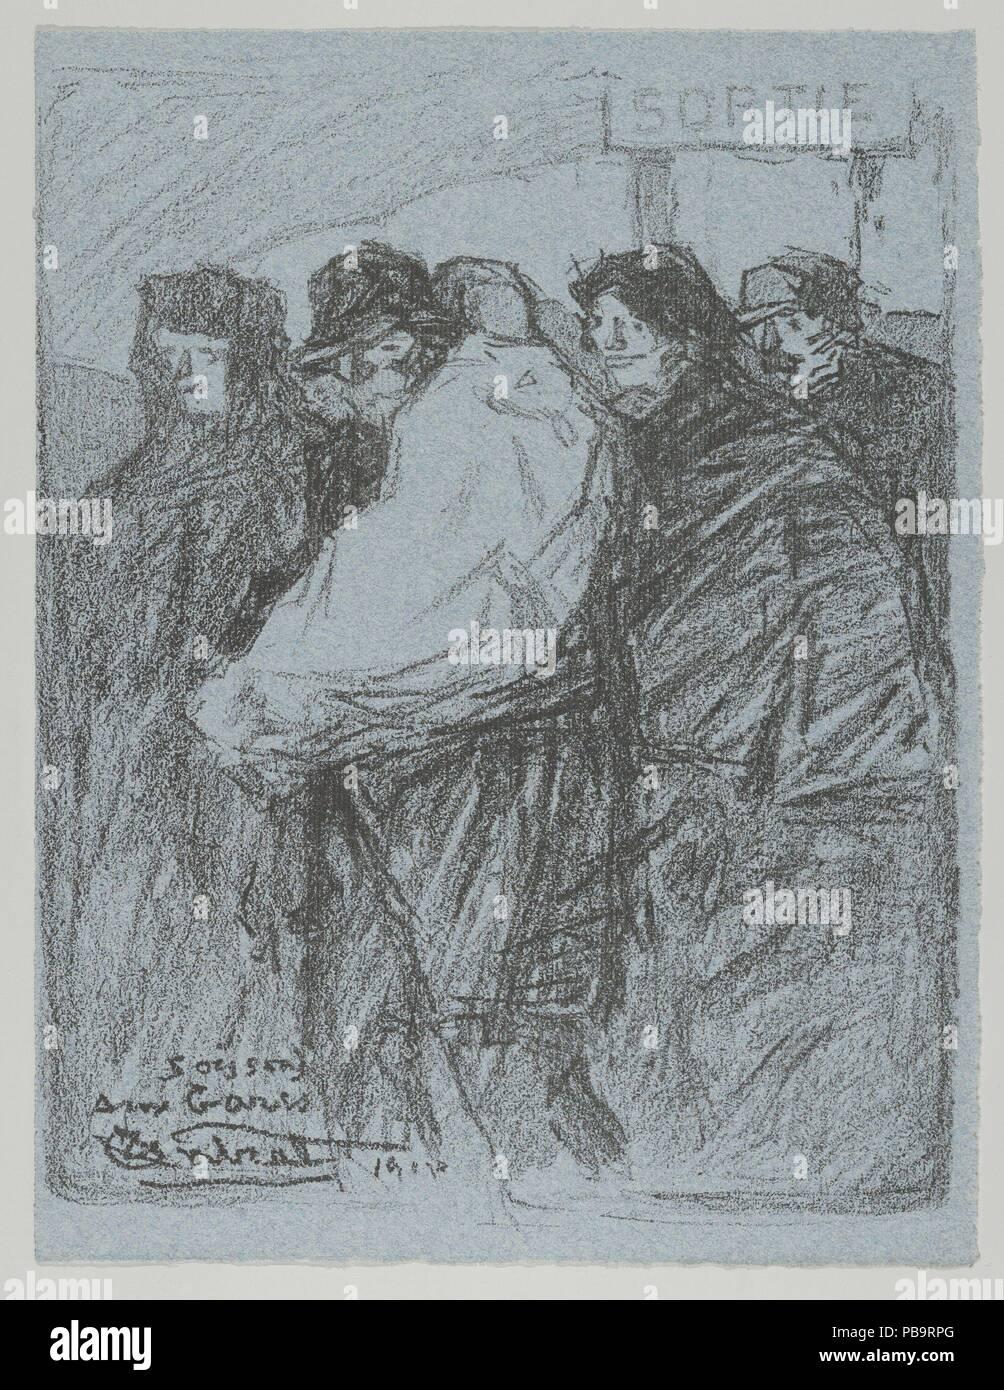 Soissons Aux Gares From Les Evacus Artist Louis Robert Antral